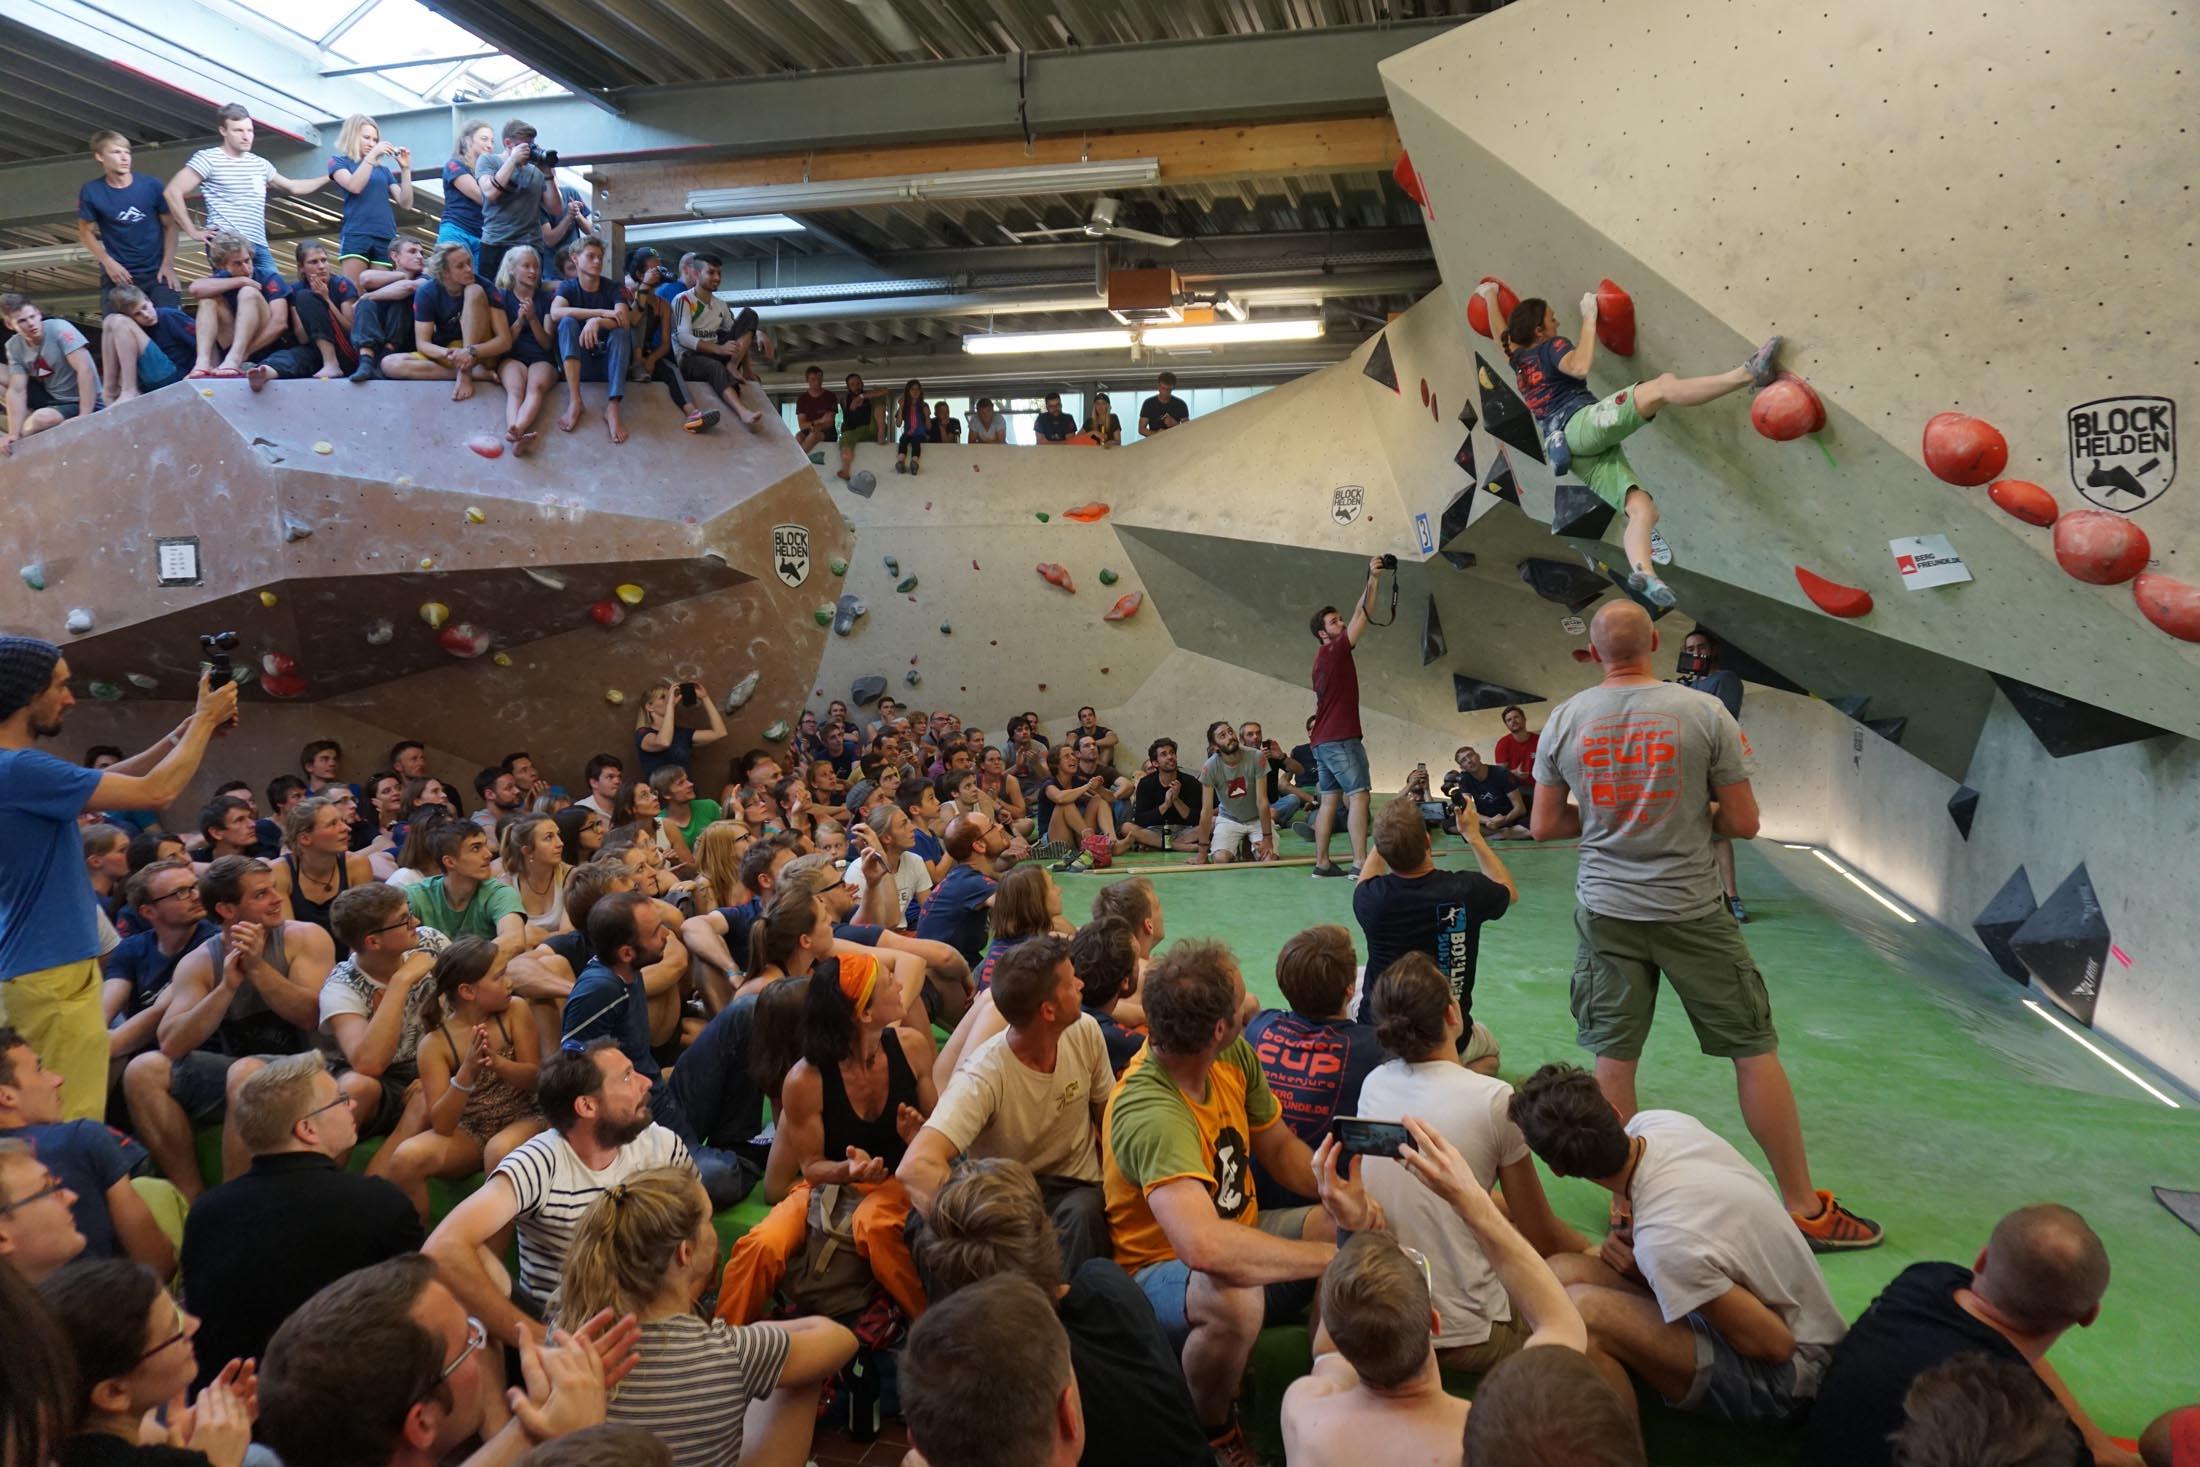 Finale, internationaler bouldercup Frankenjura 2016, BLOCKHELDEN Erlangen, Mammut, Bergfreunde.de, Boulderwettkampf07092016648